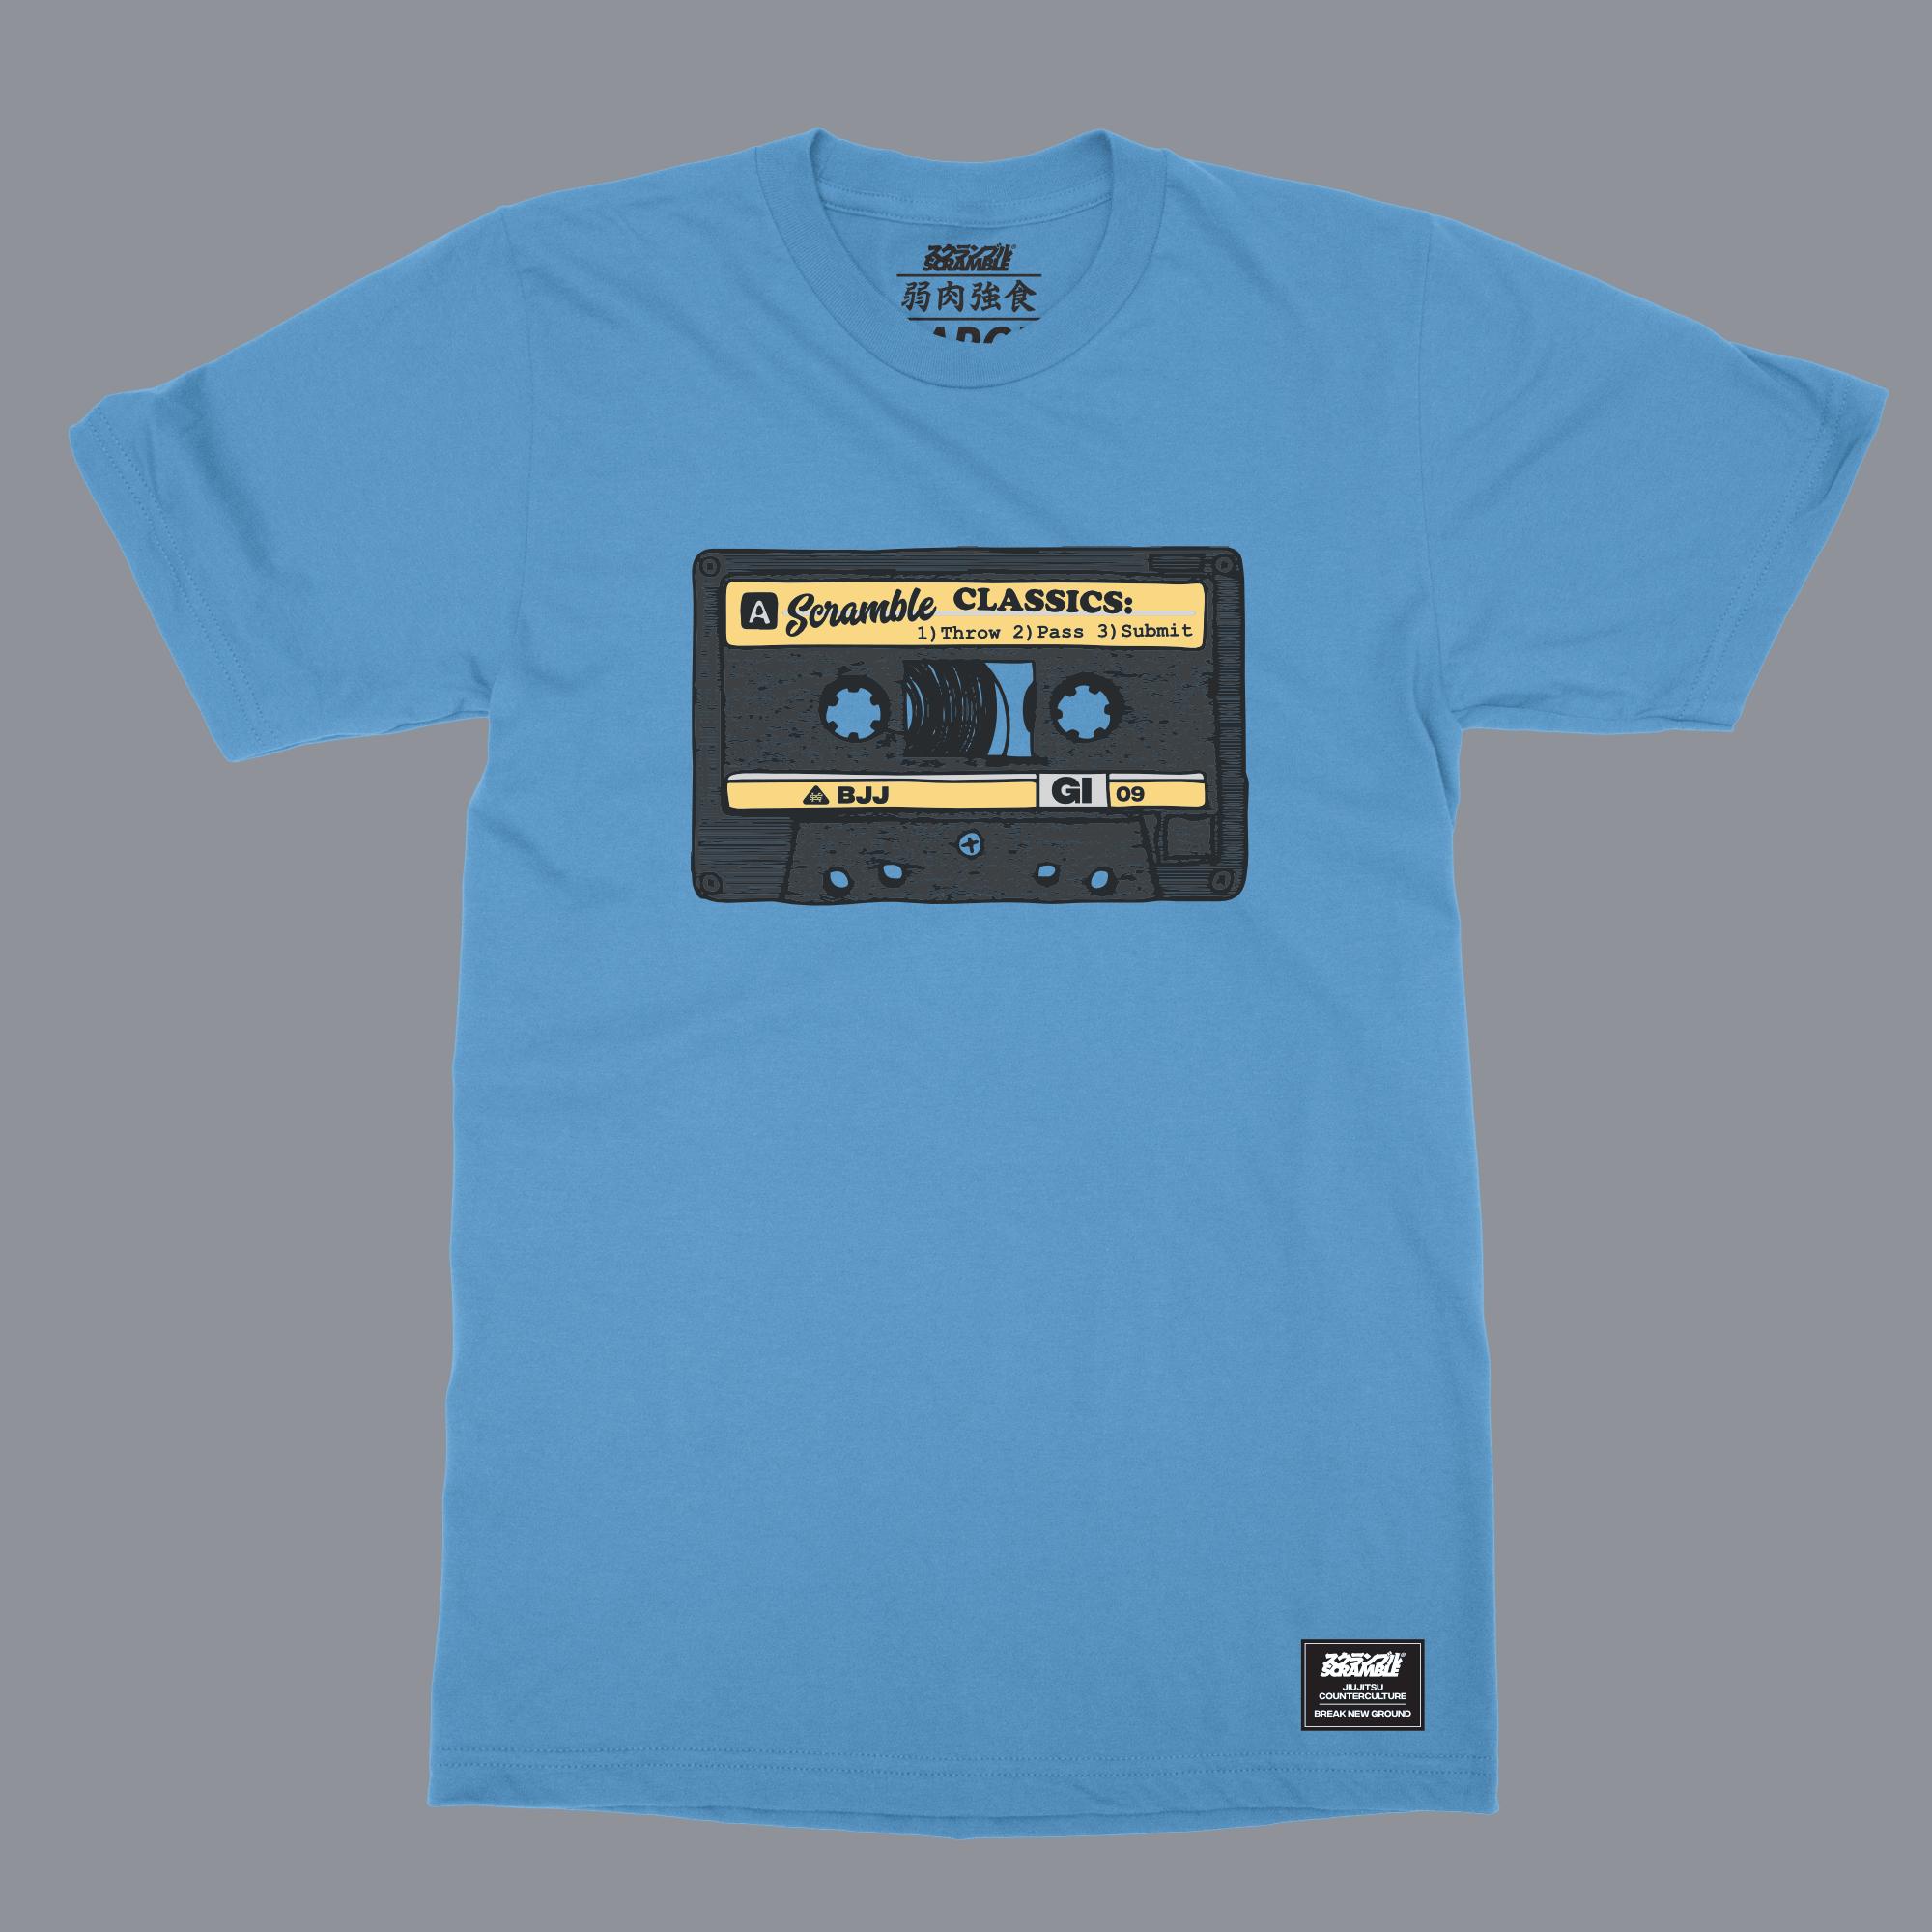 SCRAMBLE OLD SCHOOL T-SHIRT – ブルー|格闘技 柔術Tシャツ